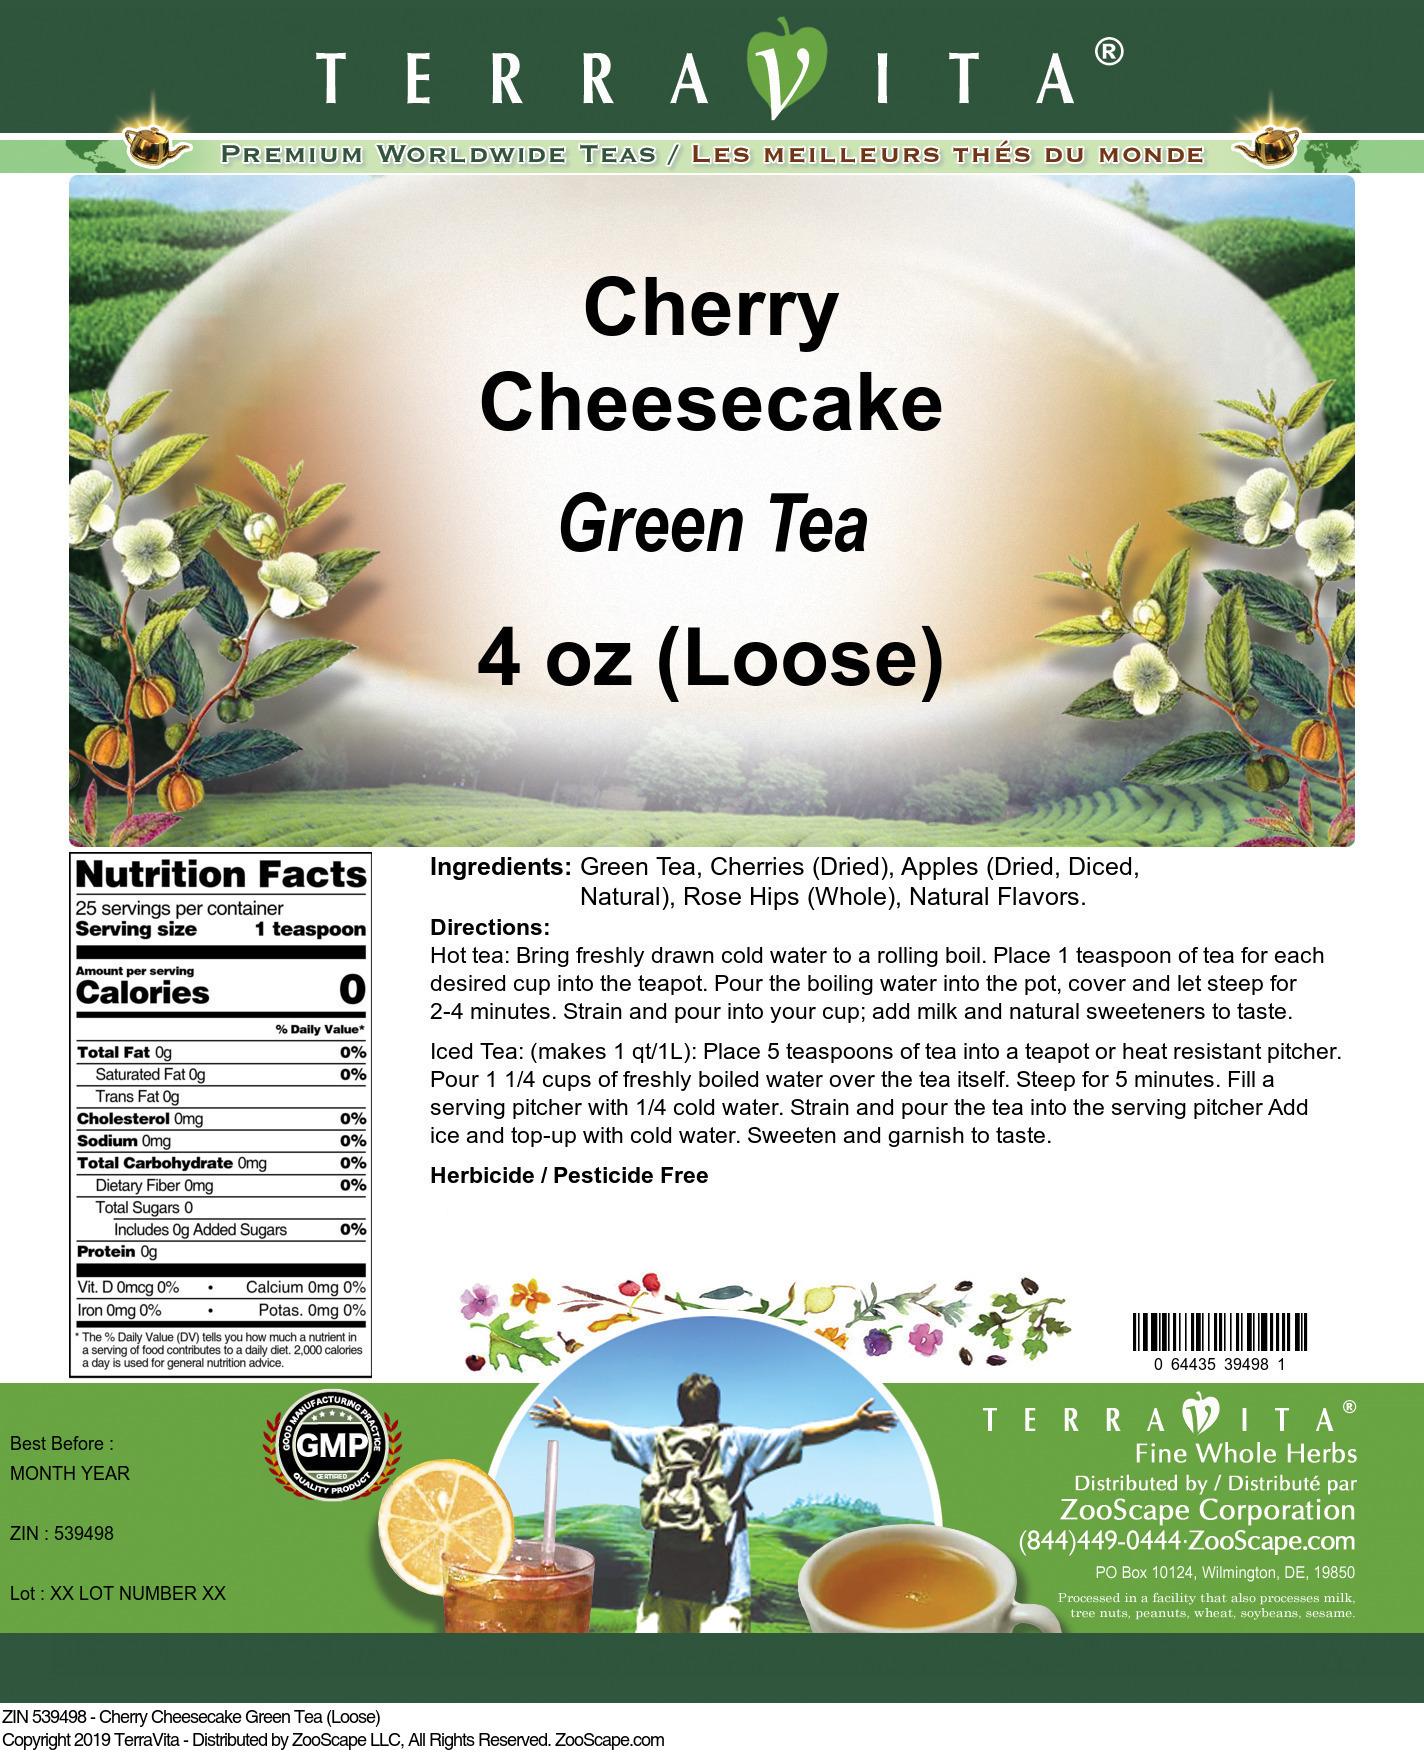 Cherry Cheesecake Green Tea (Loose)